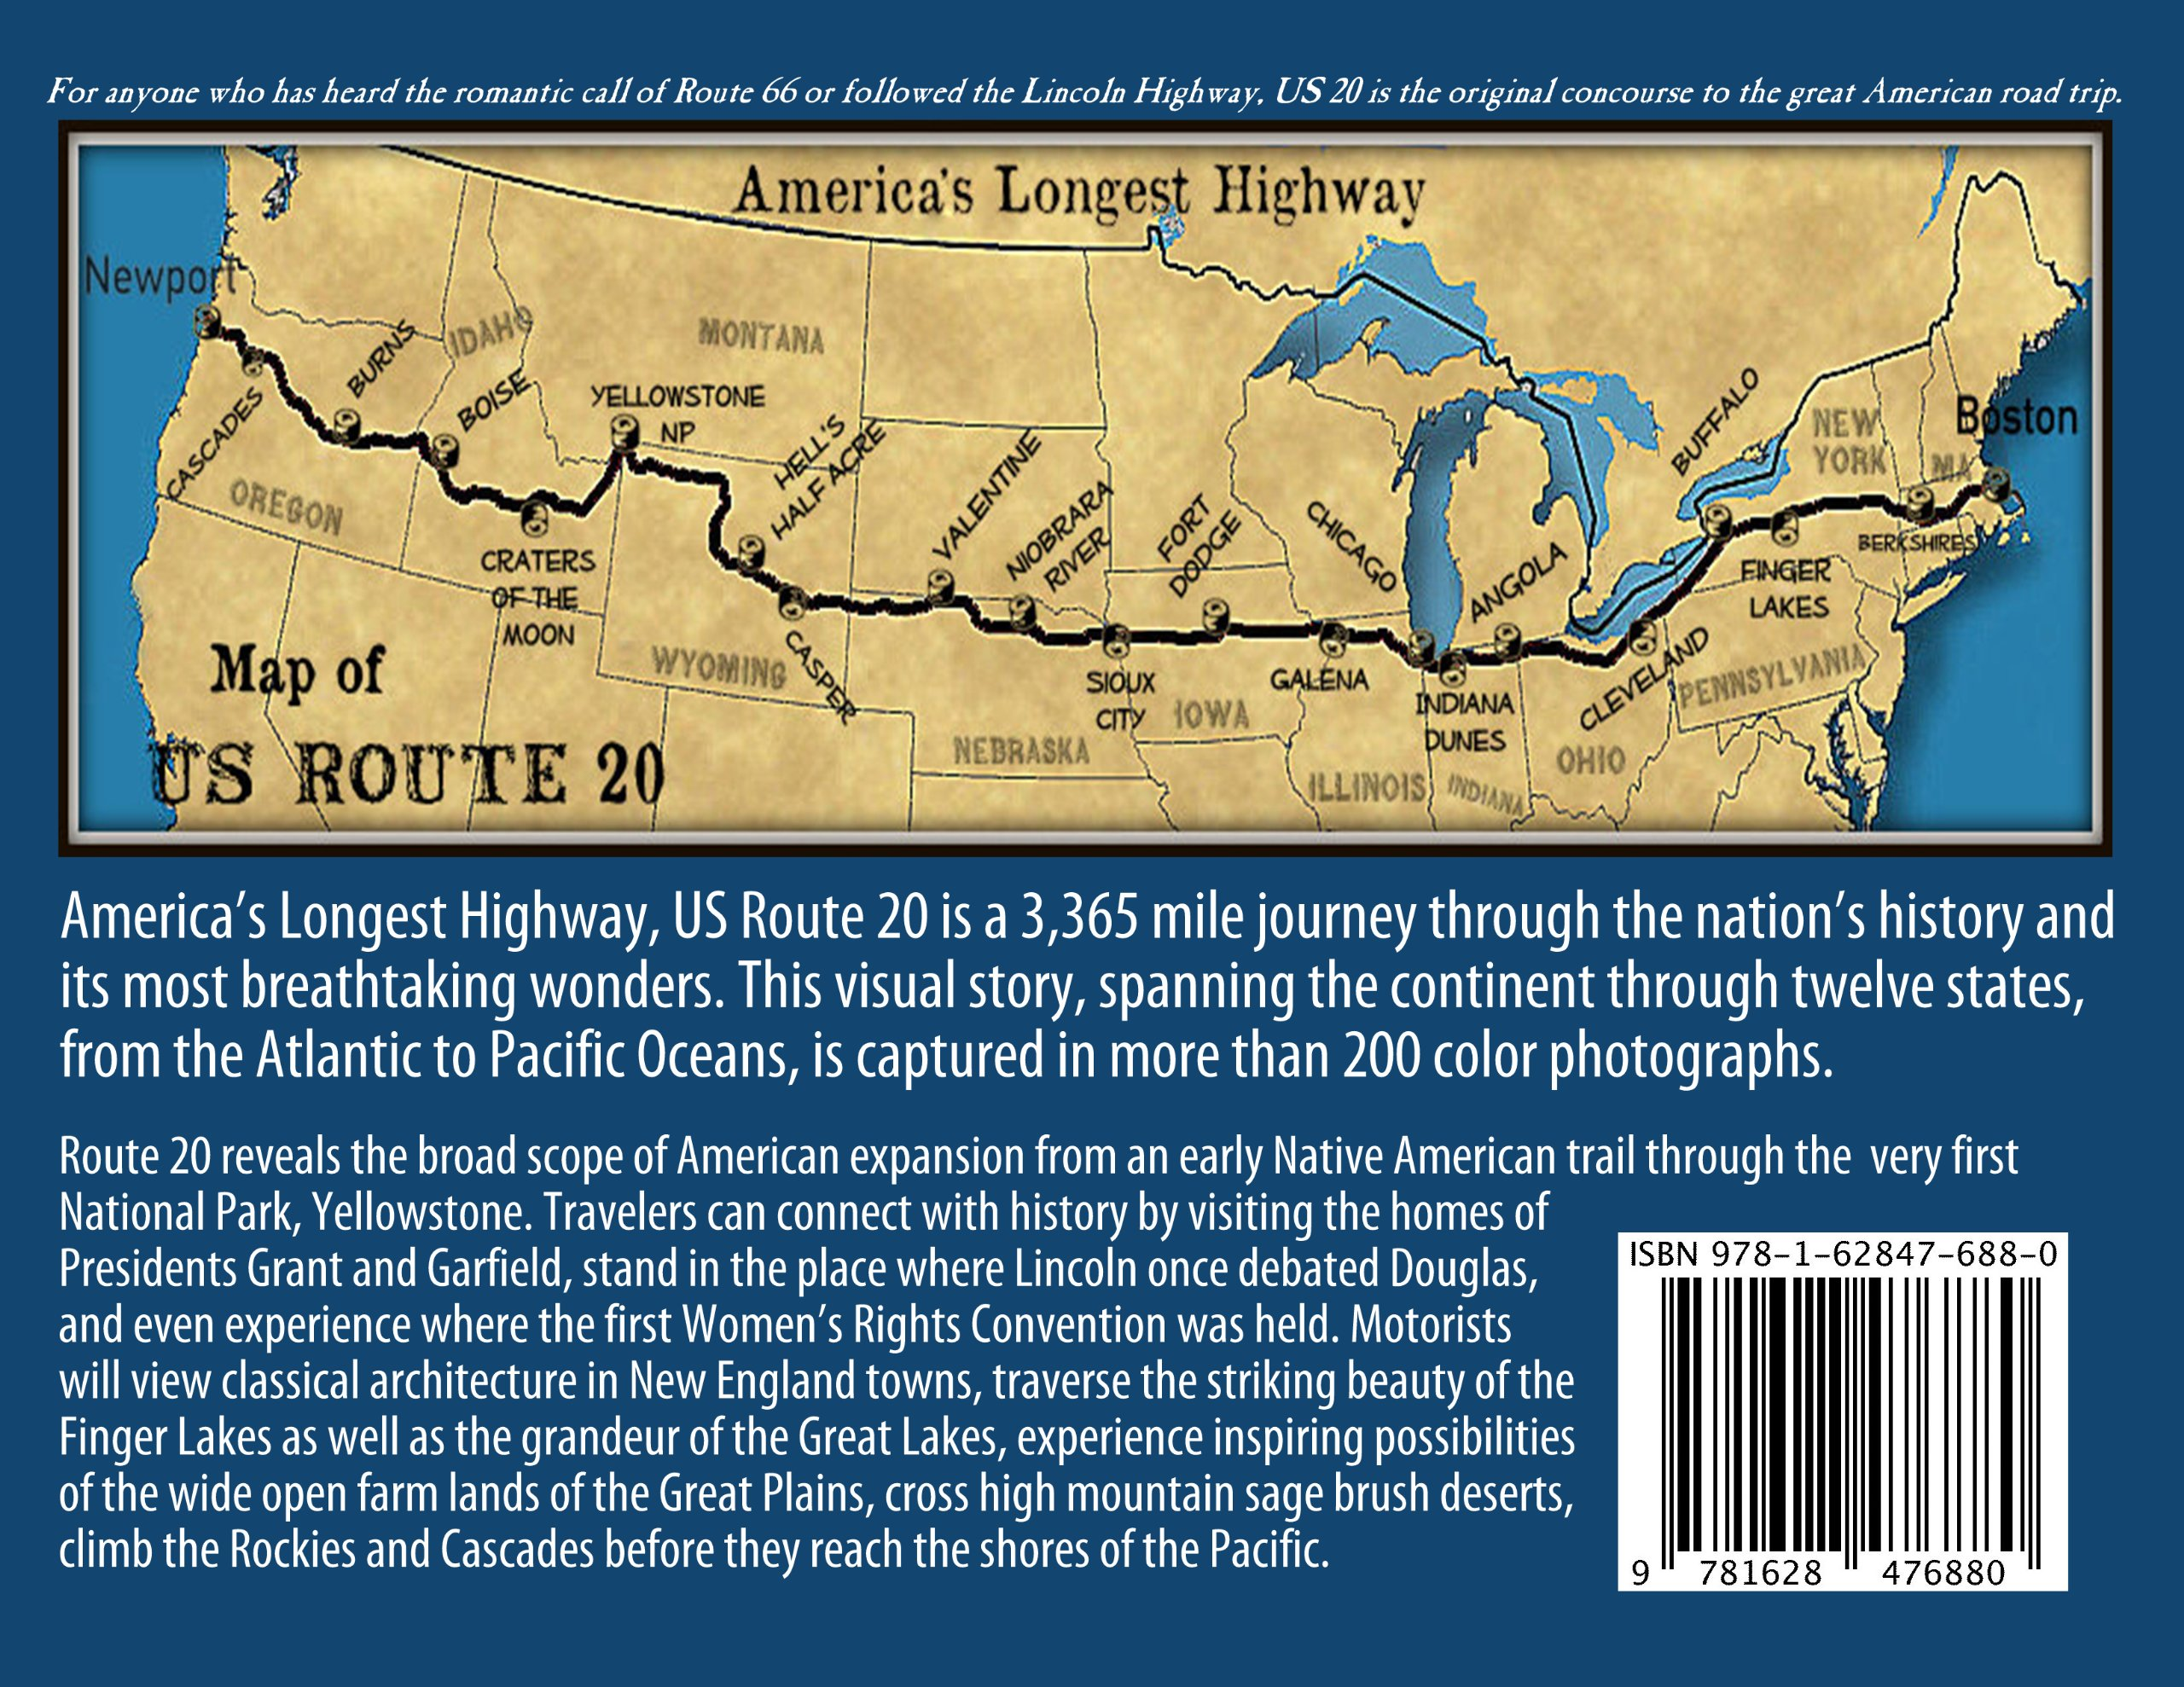 historic us route 20 a journey across america s longest highway bryan farr 9781628476880 amazon com books